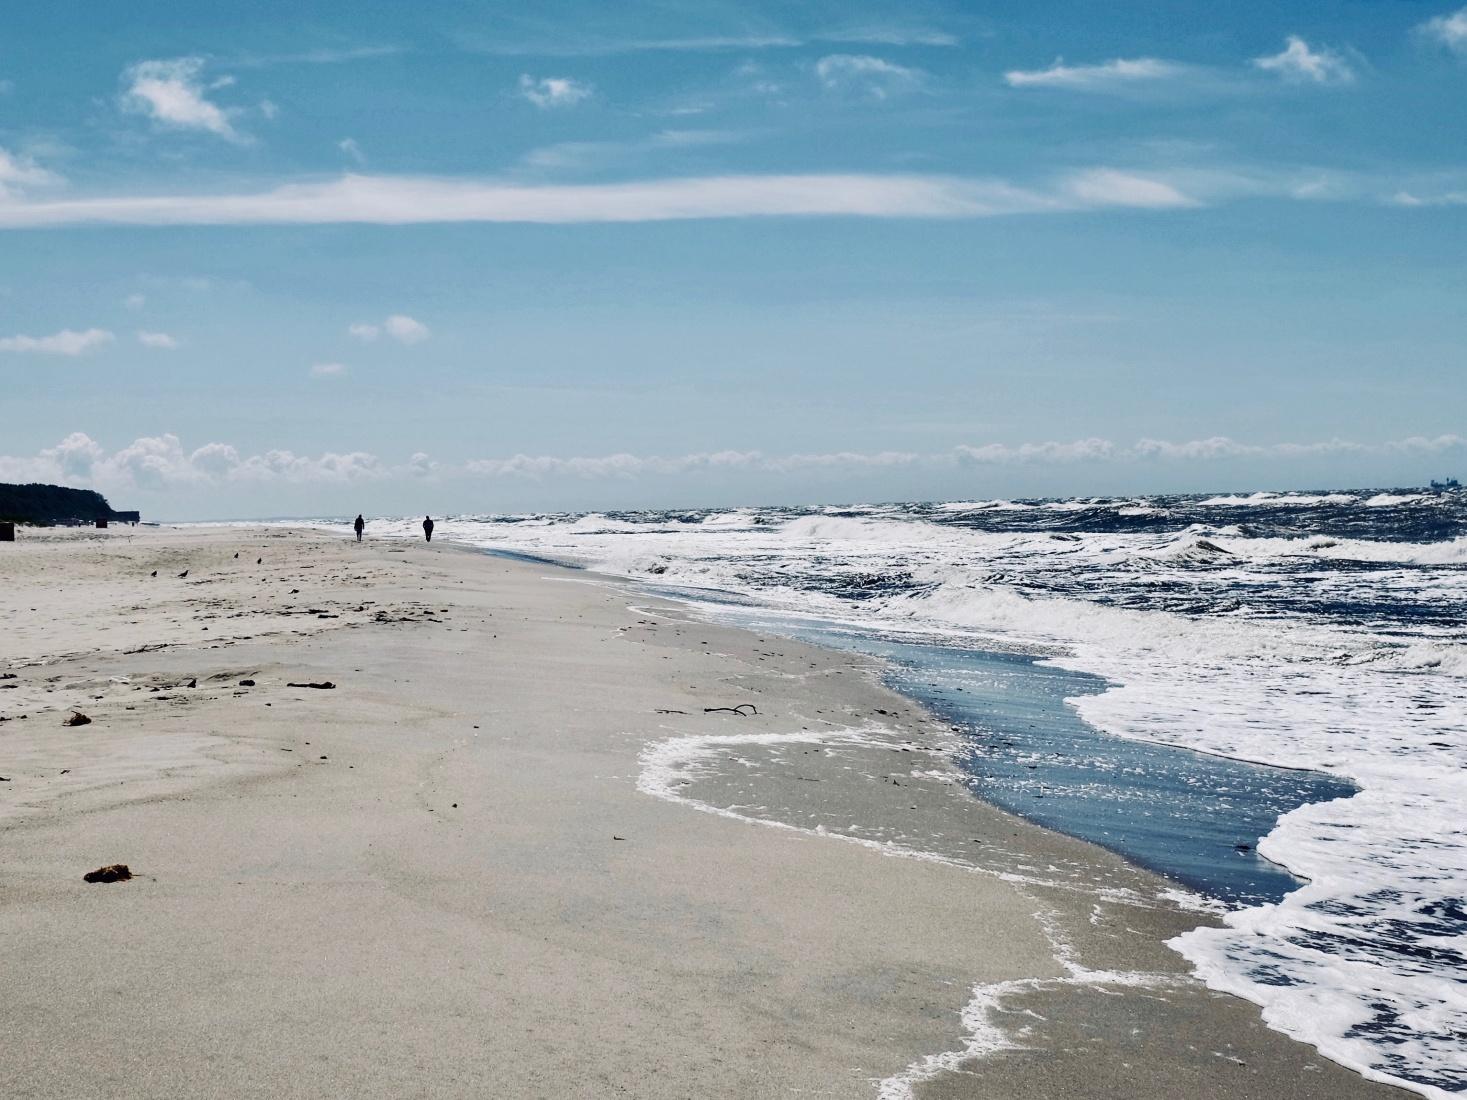 A beach along the Kaliningrad Curonian Spit, outside Kaliningrad, Russia.